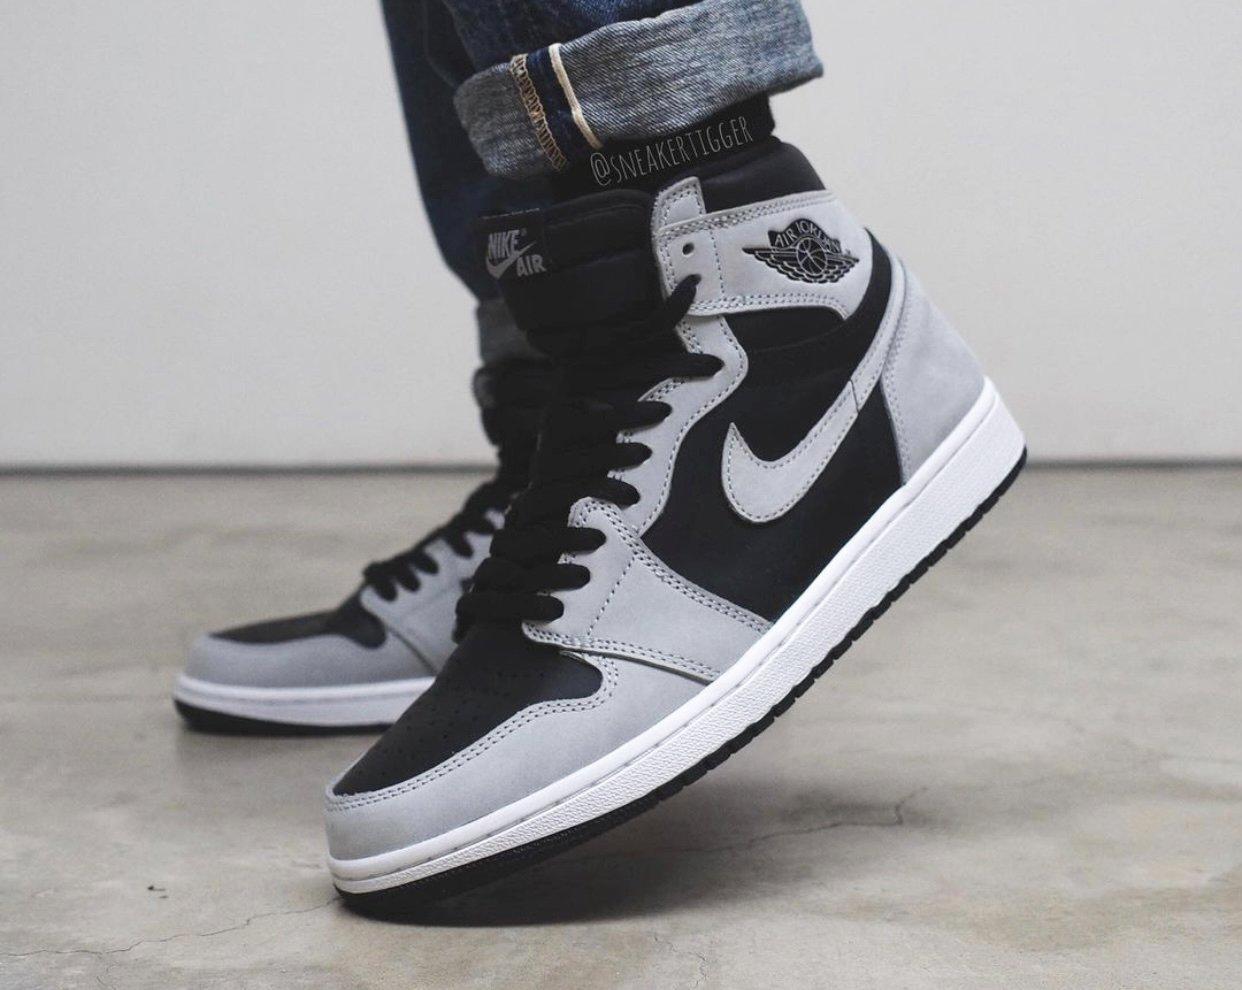 Air Jordan 1 High OG Shadow 2.0 On Feet